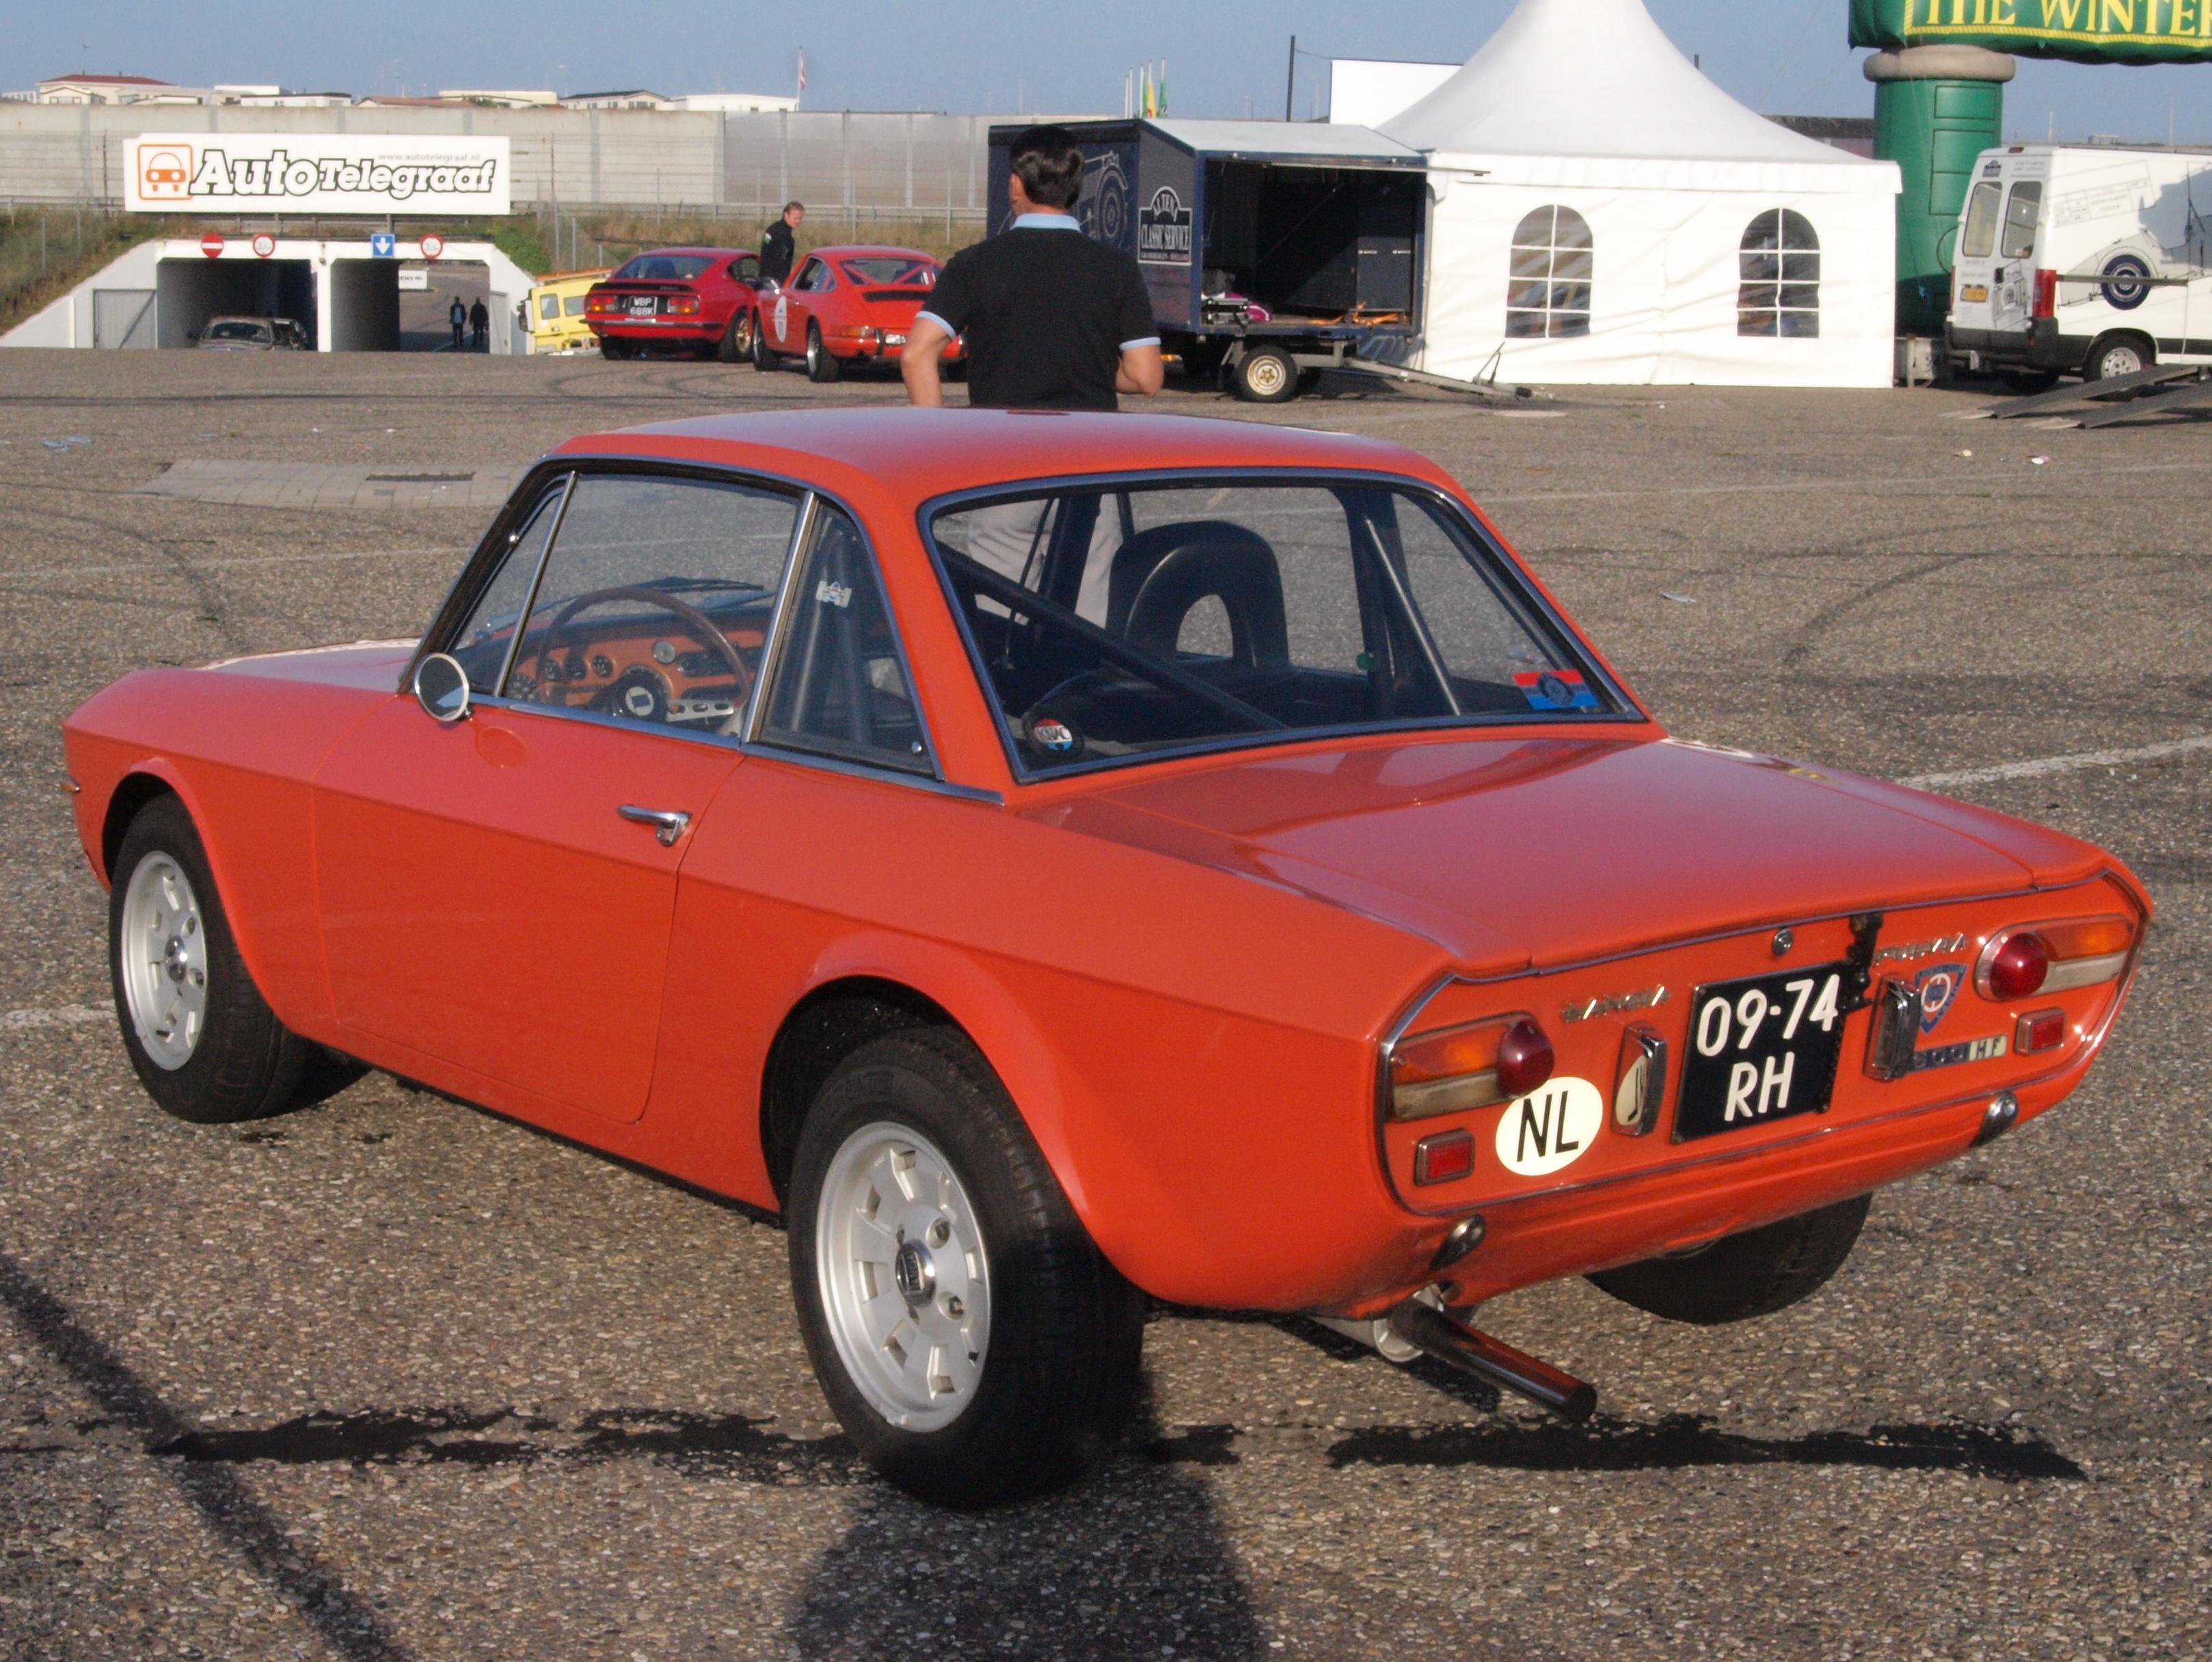 http://upload.wikimedia.org/wikipedia/commons/5/53/Lancia_Fulvia_Coupe_Rallye_1.6_HF_2nd_Series_dutch_licence_registration_09-74-RH_pic3.JPG